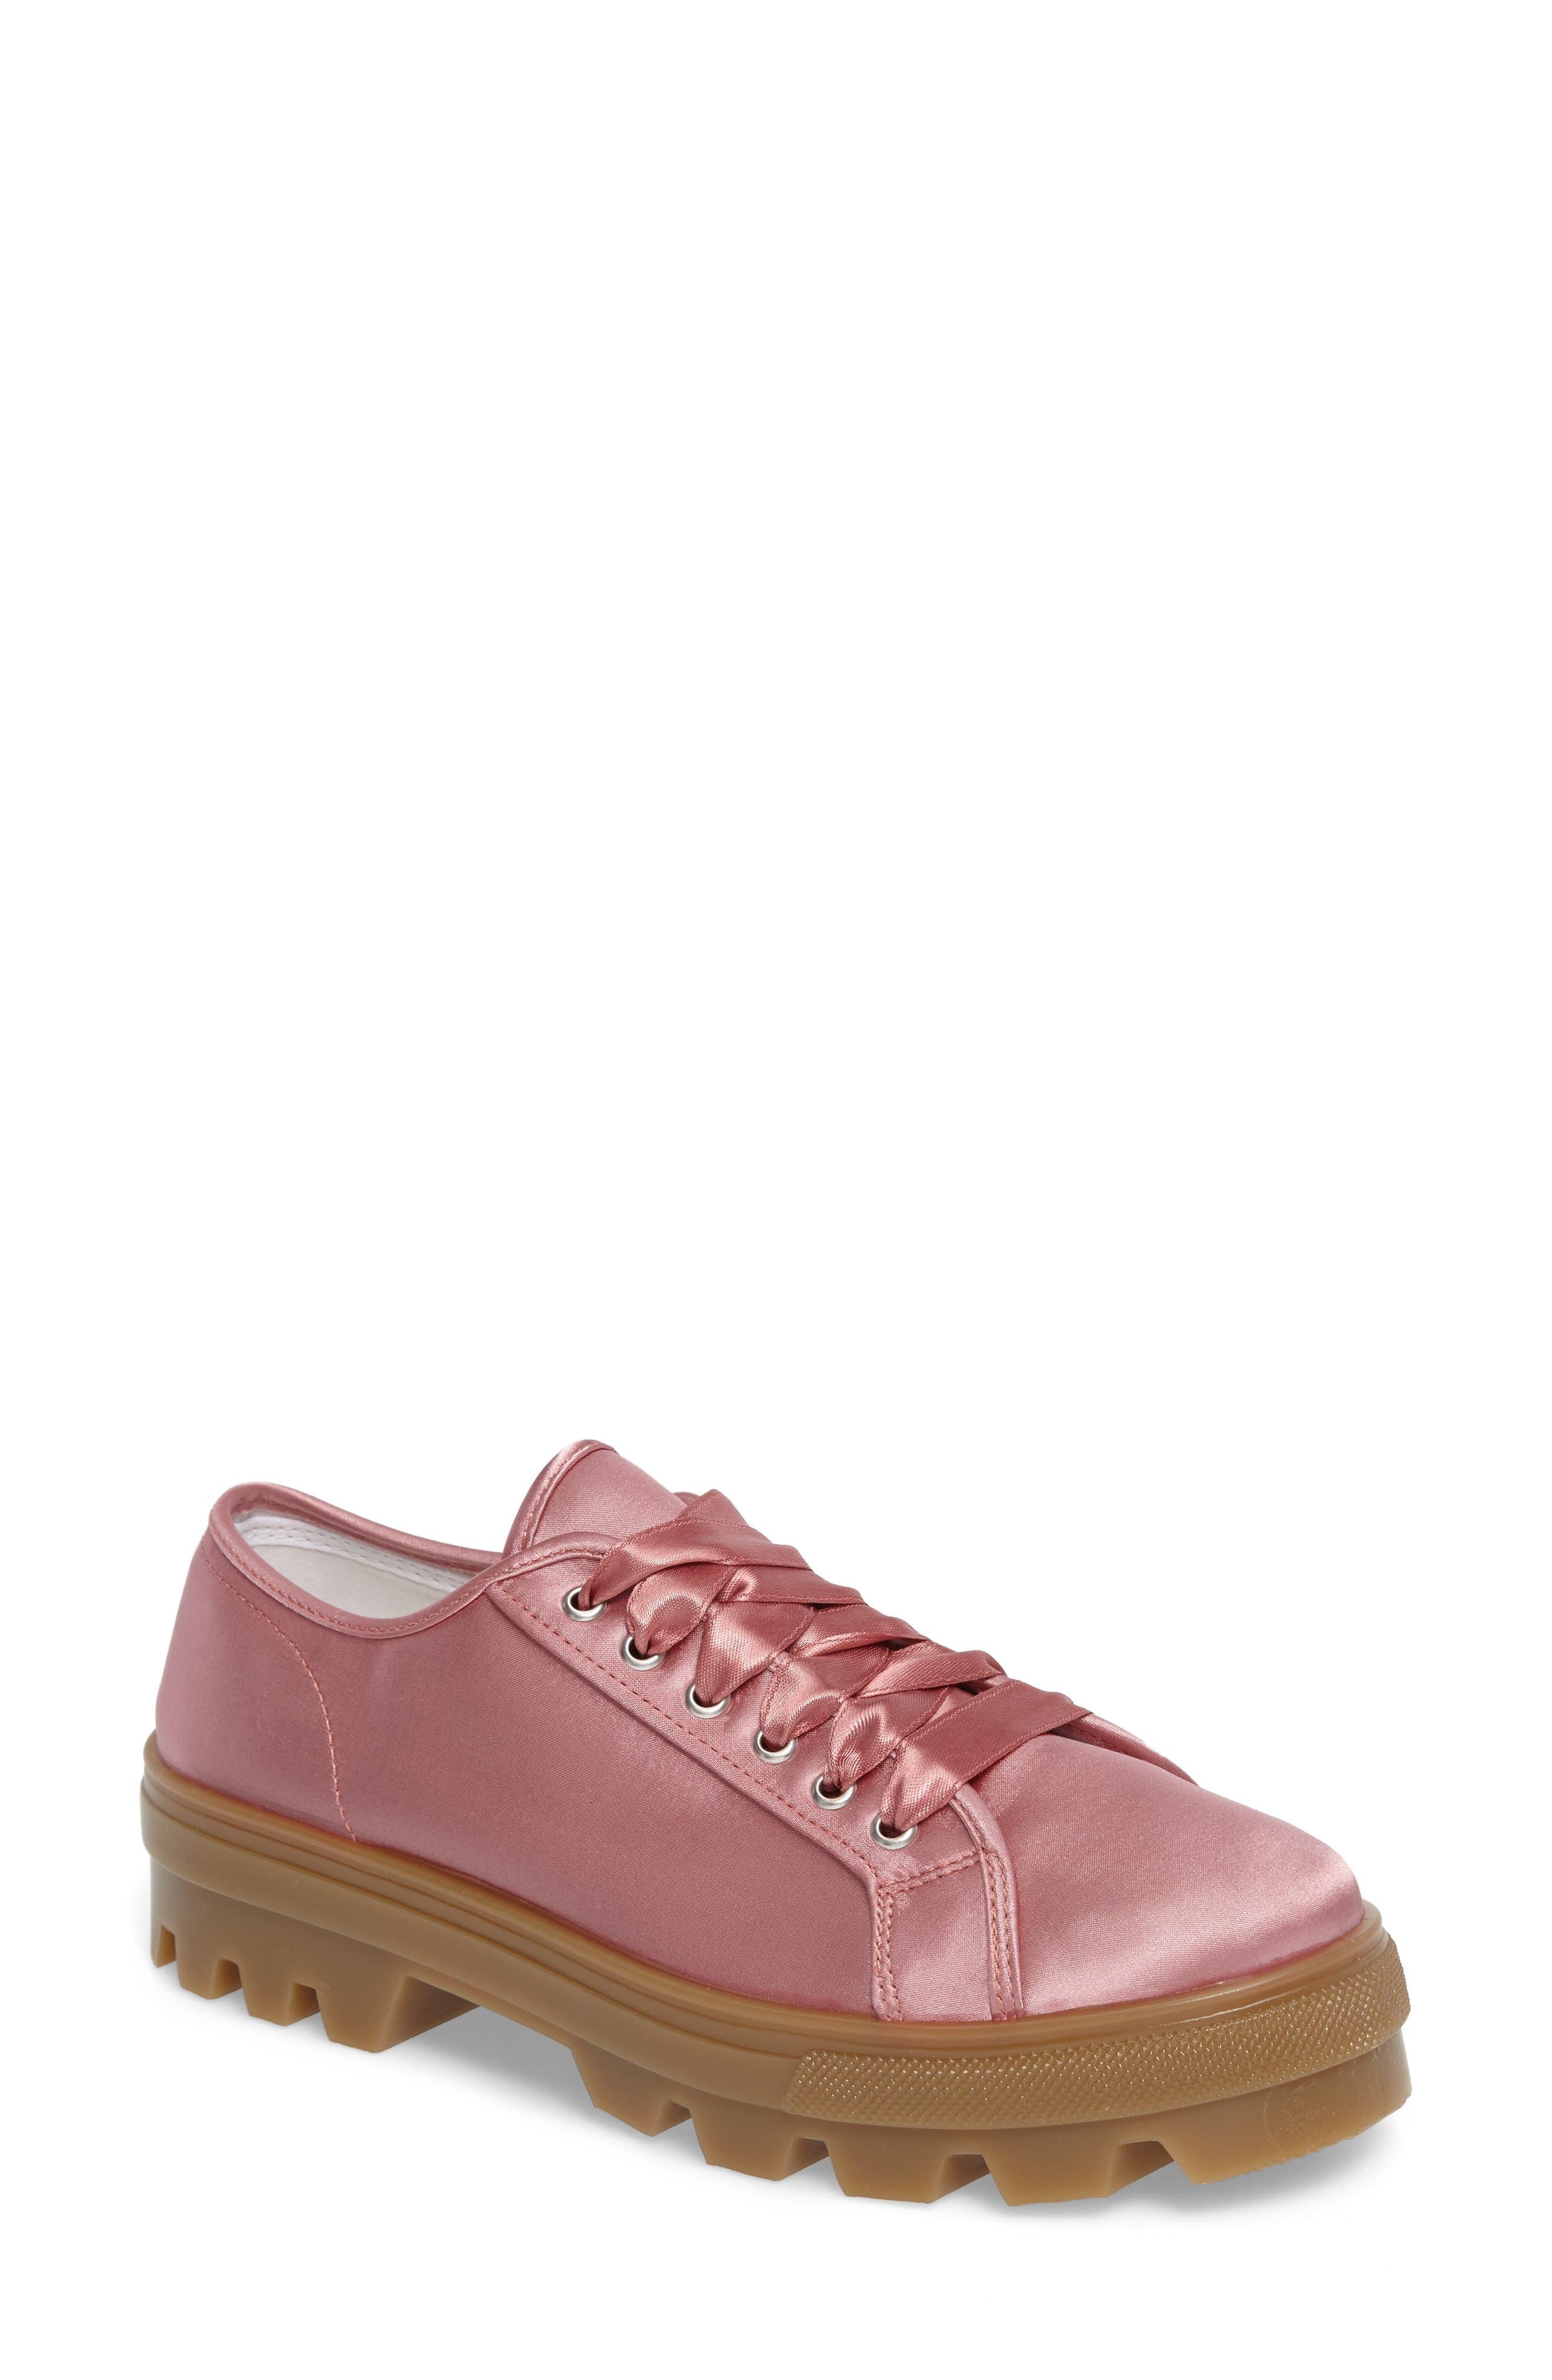 Topshop Clover Satin Sneaker (Women)